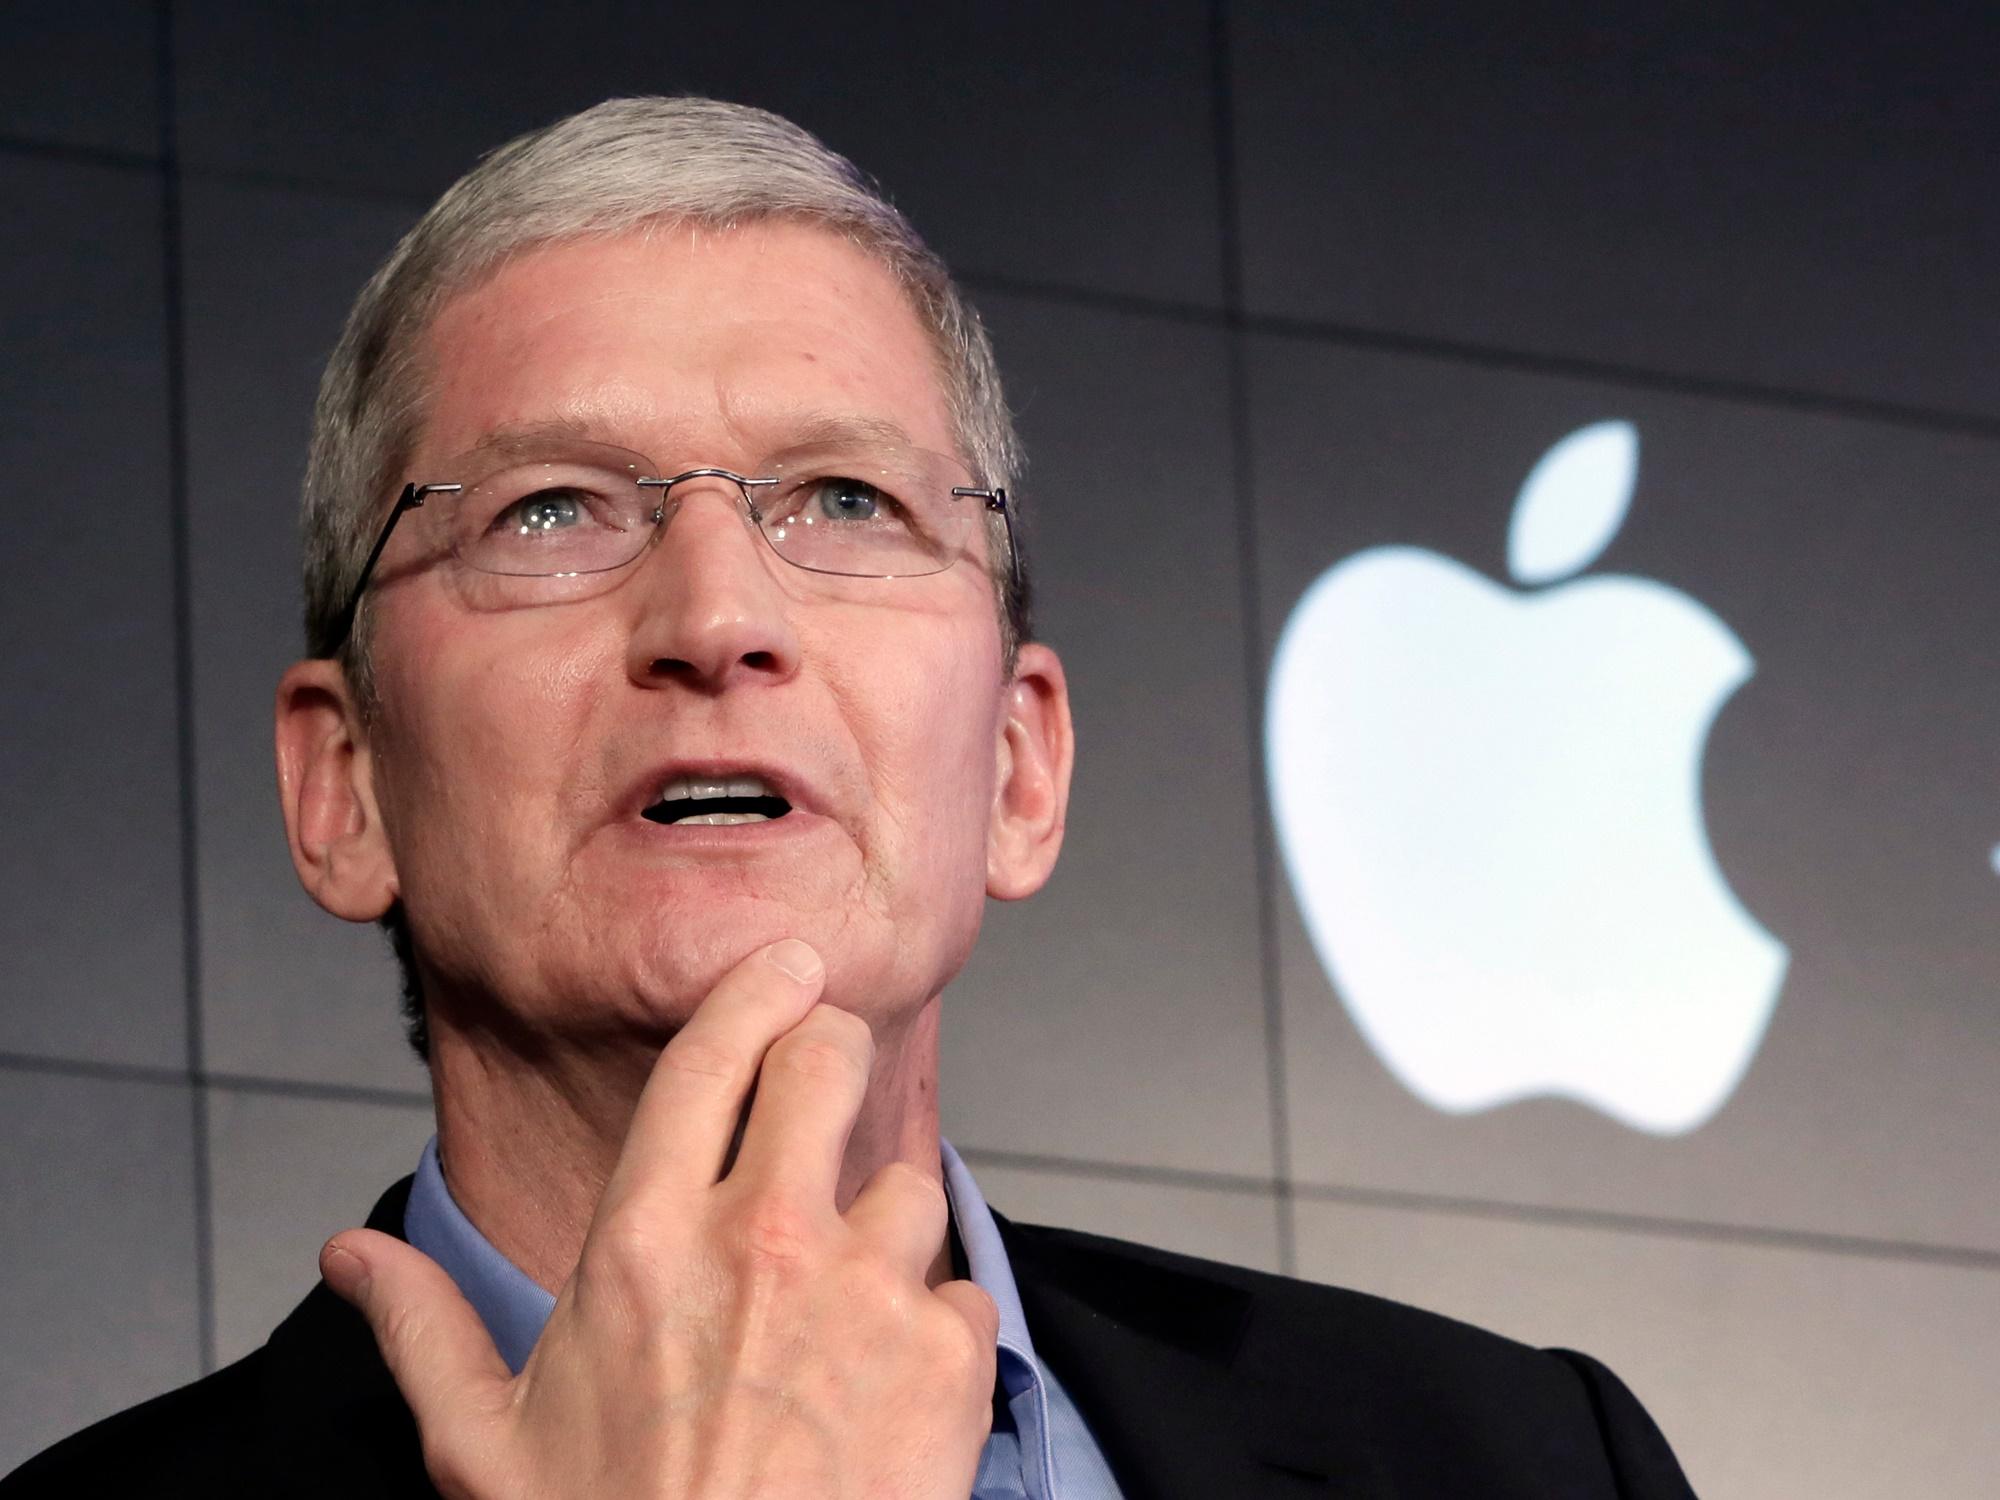 Apple diz ter avisado os consumidores que iria limitar os iPhone